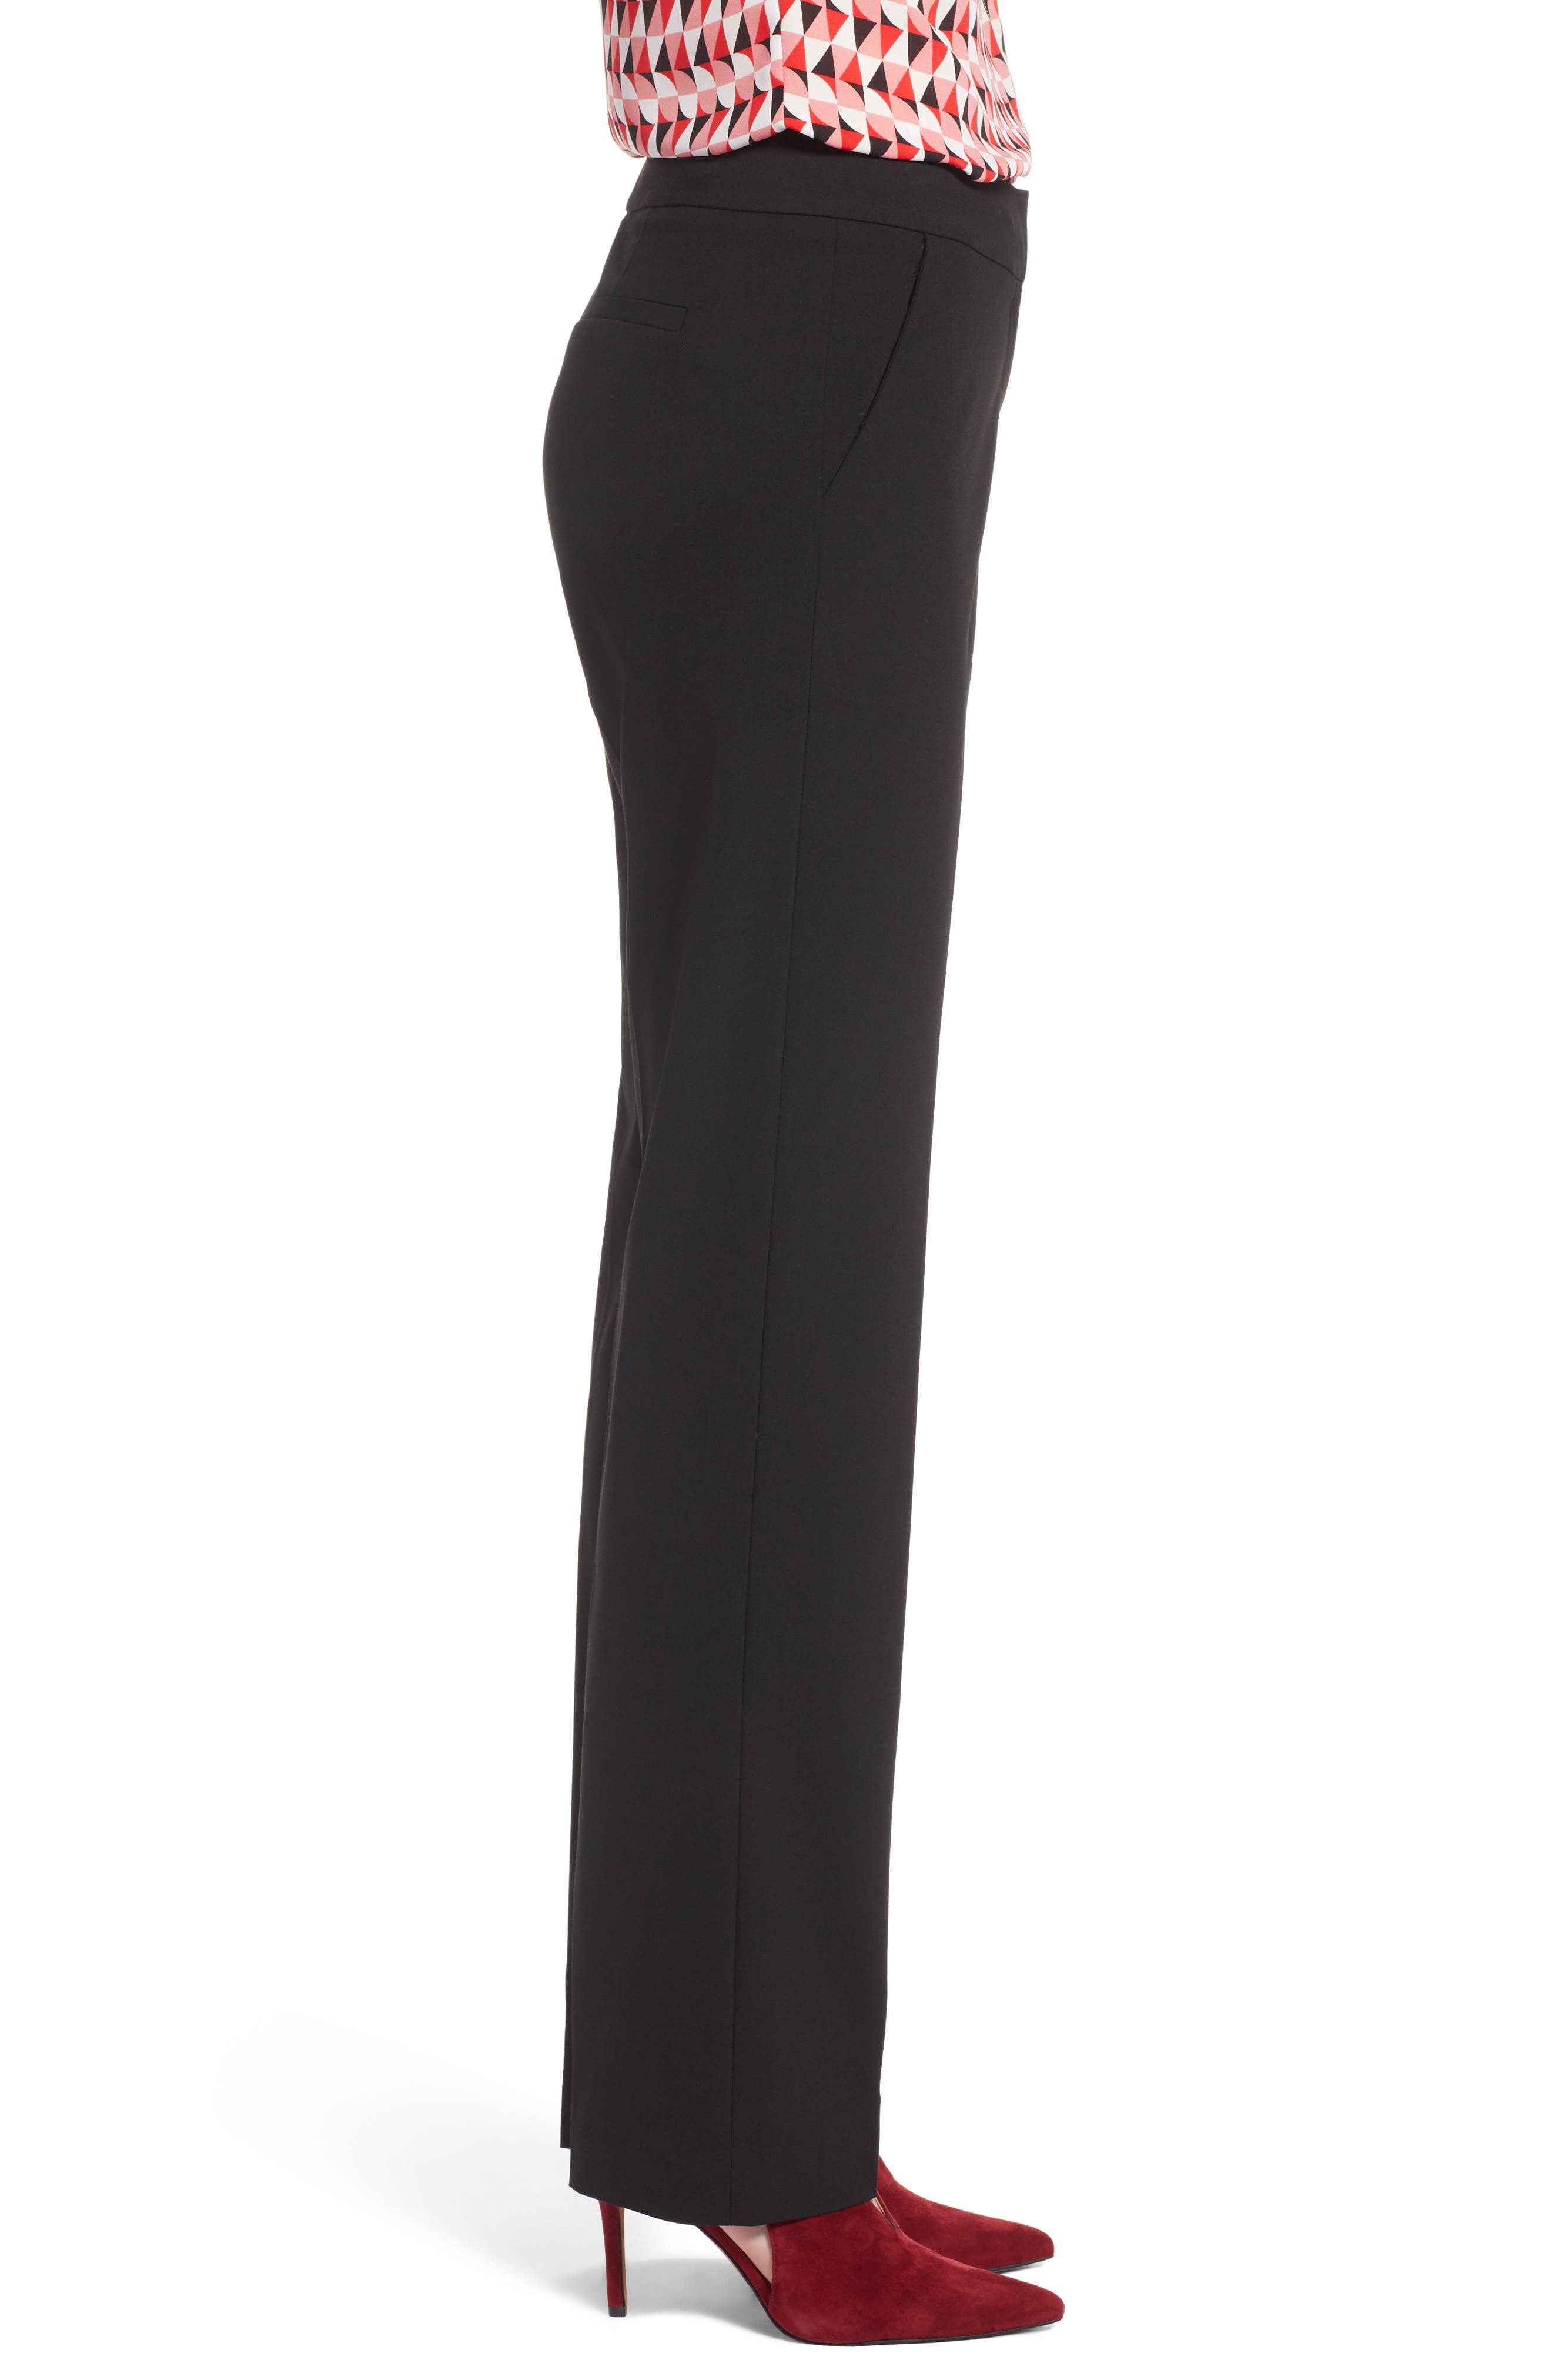 Stovepipe Pants,                             Alternate thumbnail 3, color,                             Black